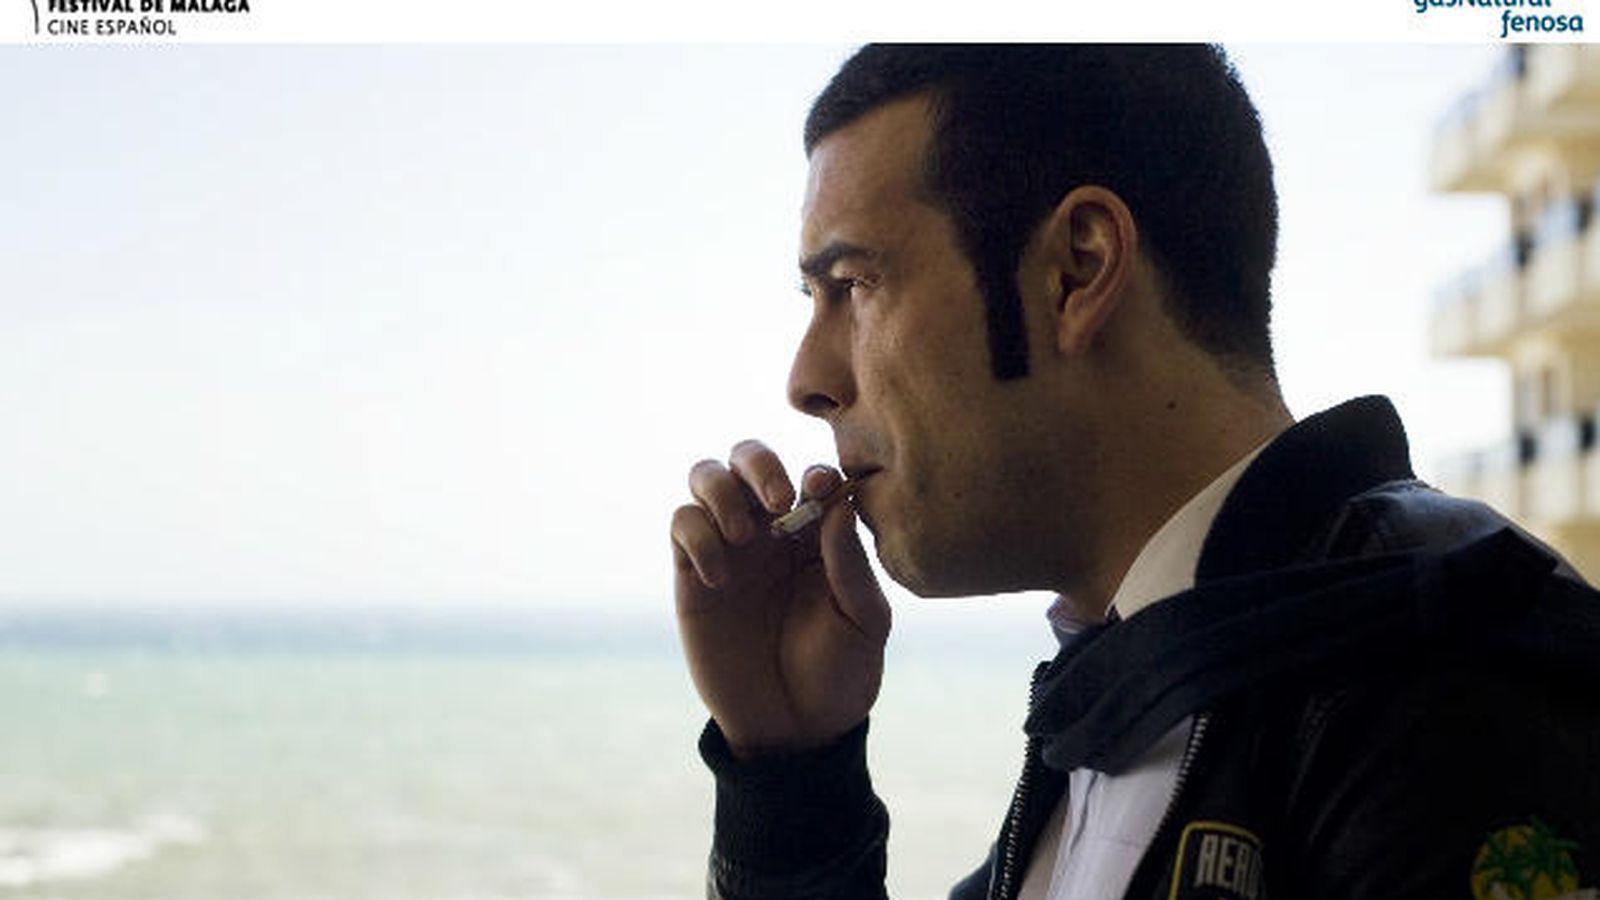 Foto: Fotograma de la película